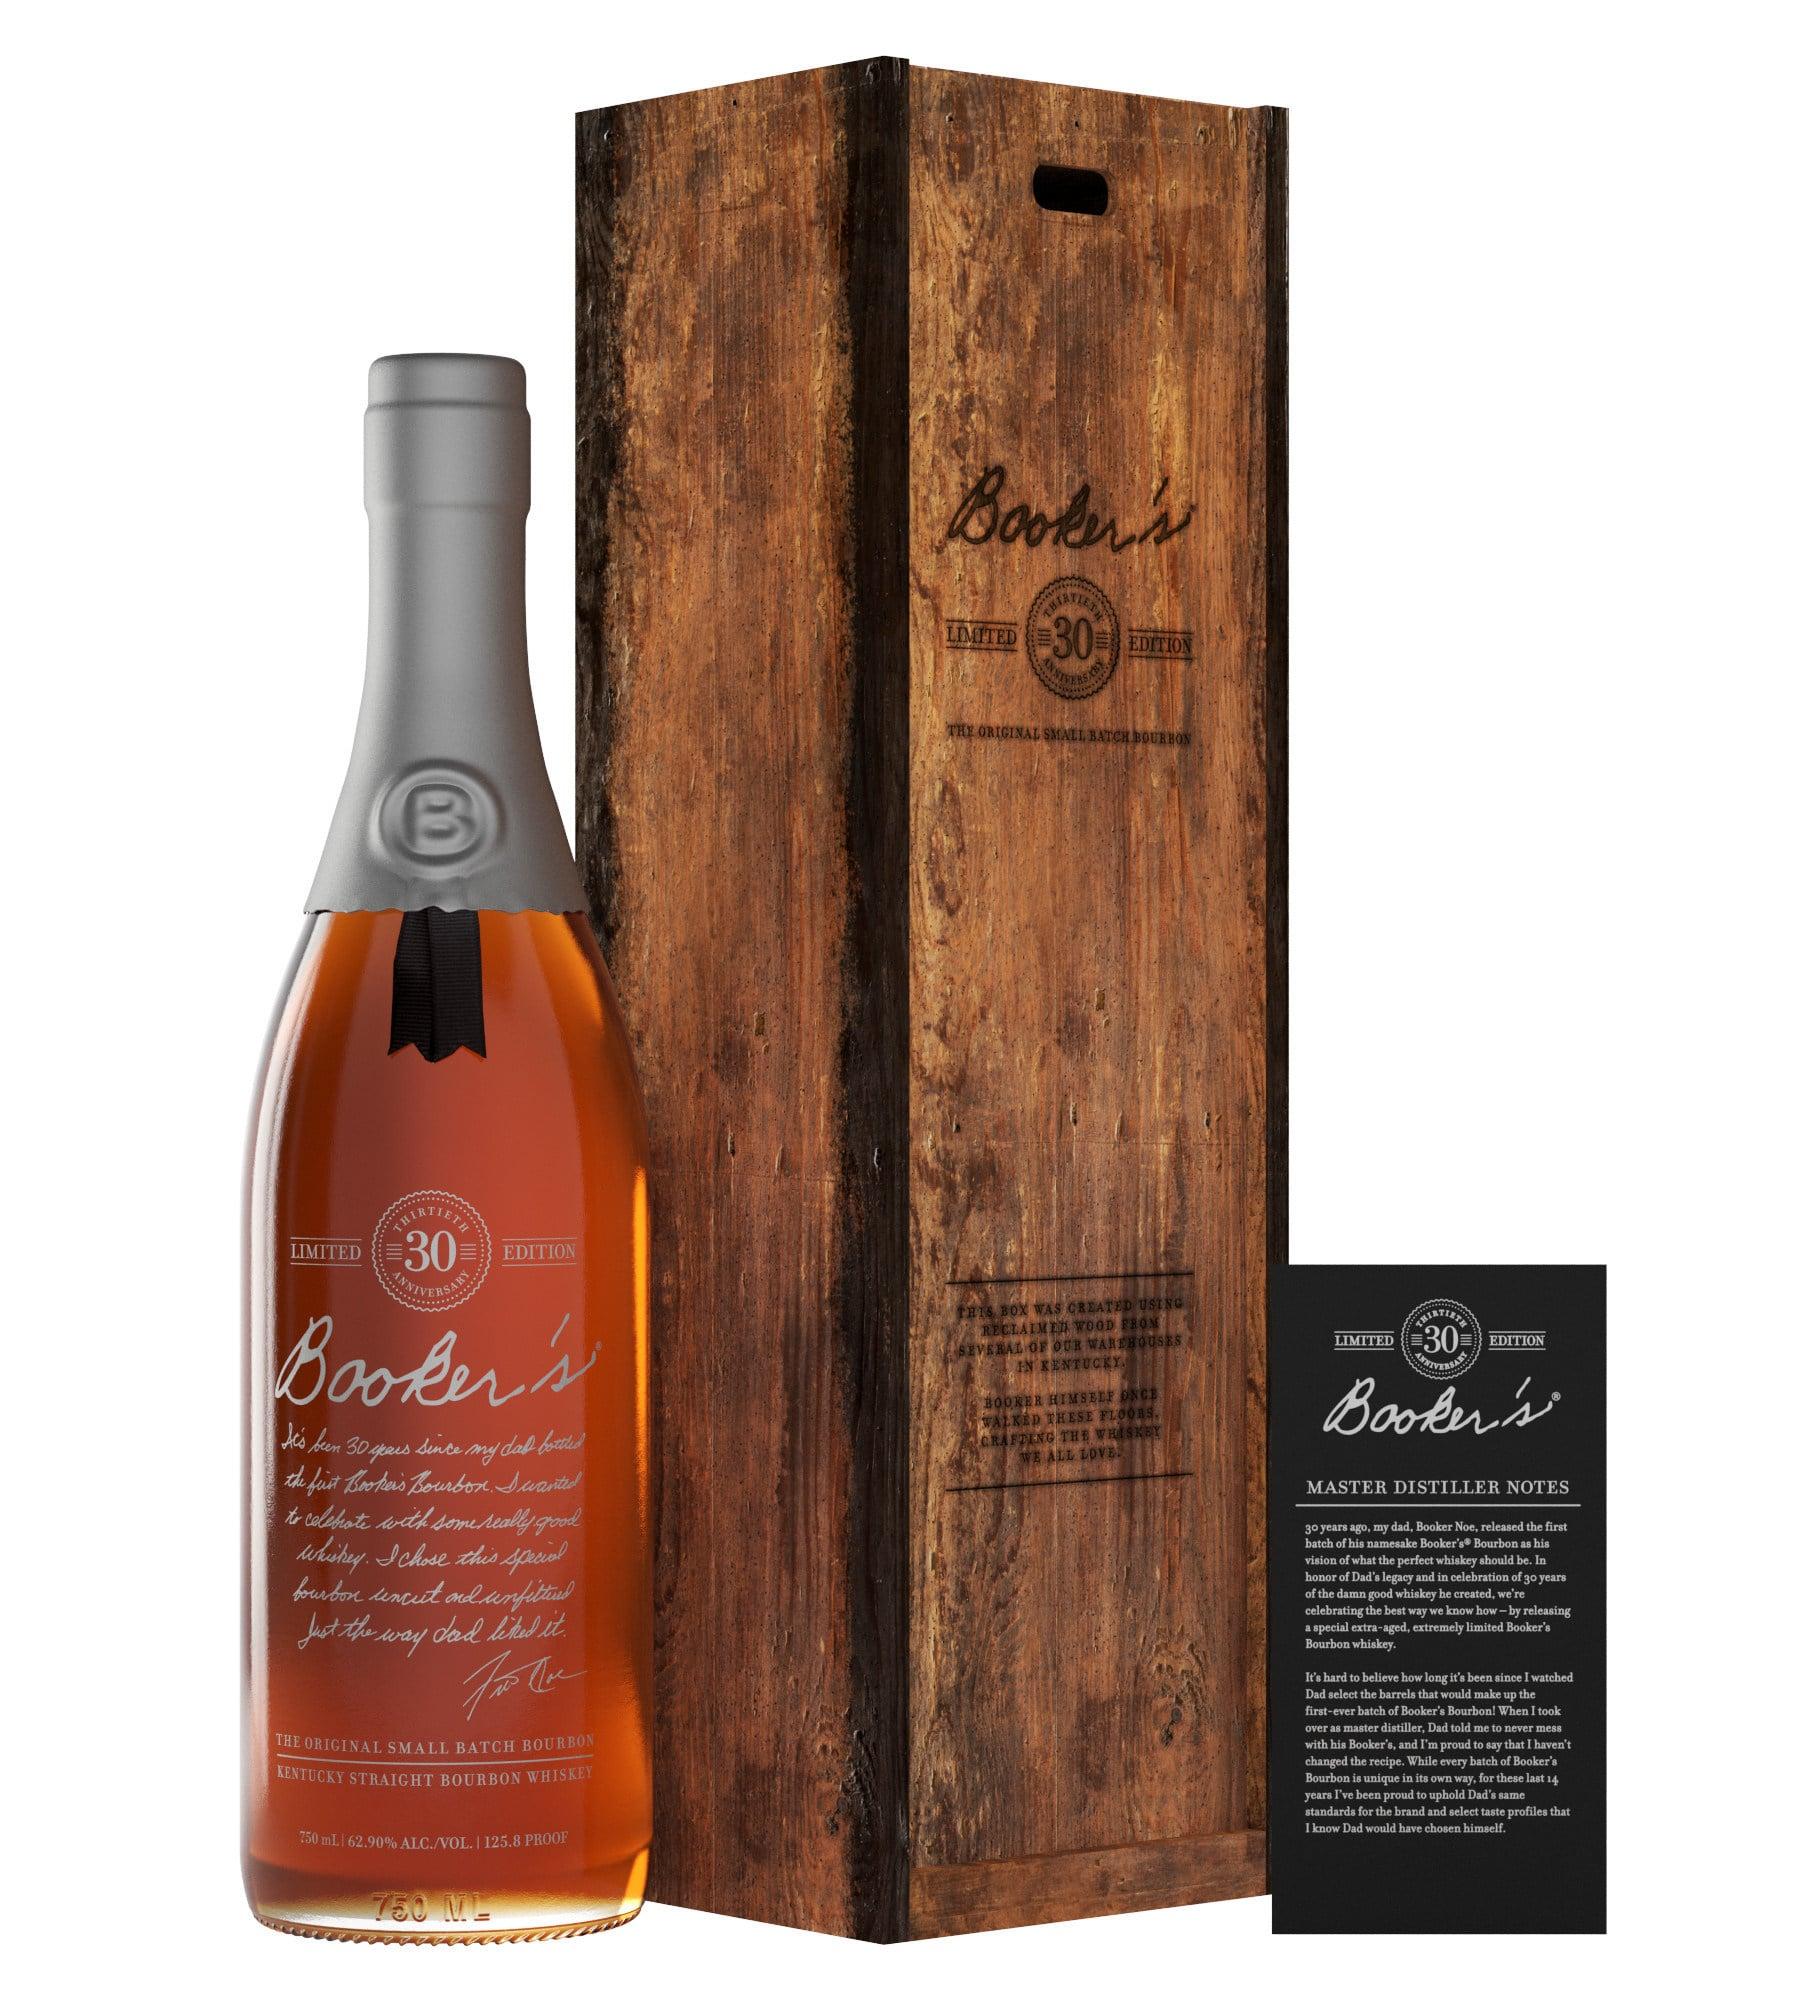 Booker's Bourbon Announces New Release photo